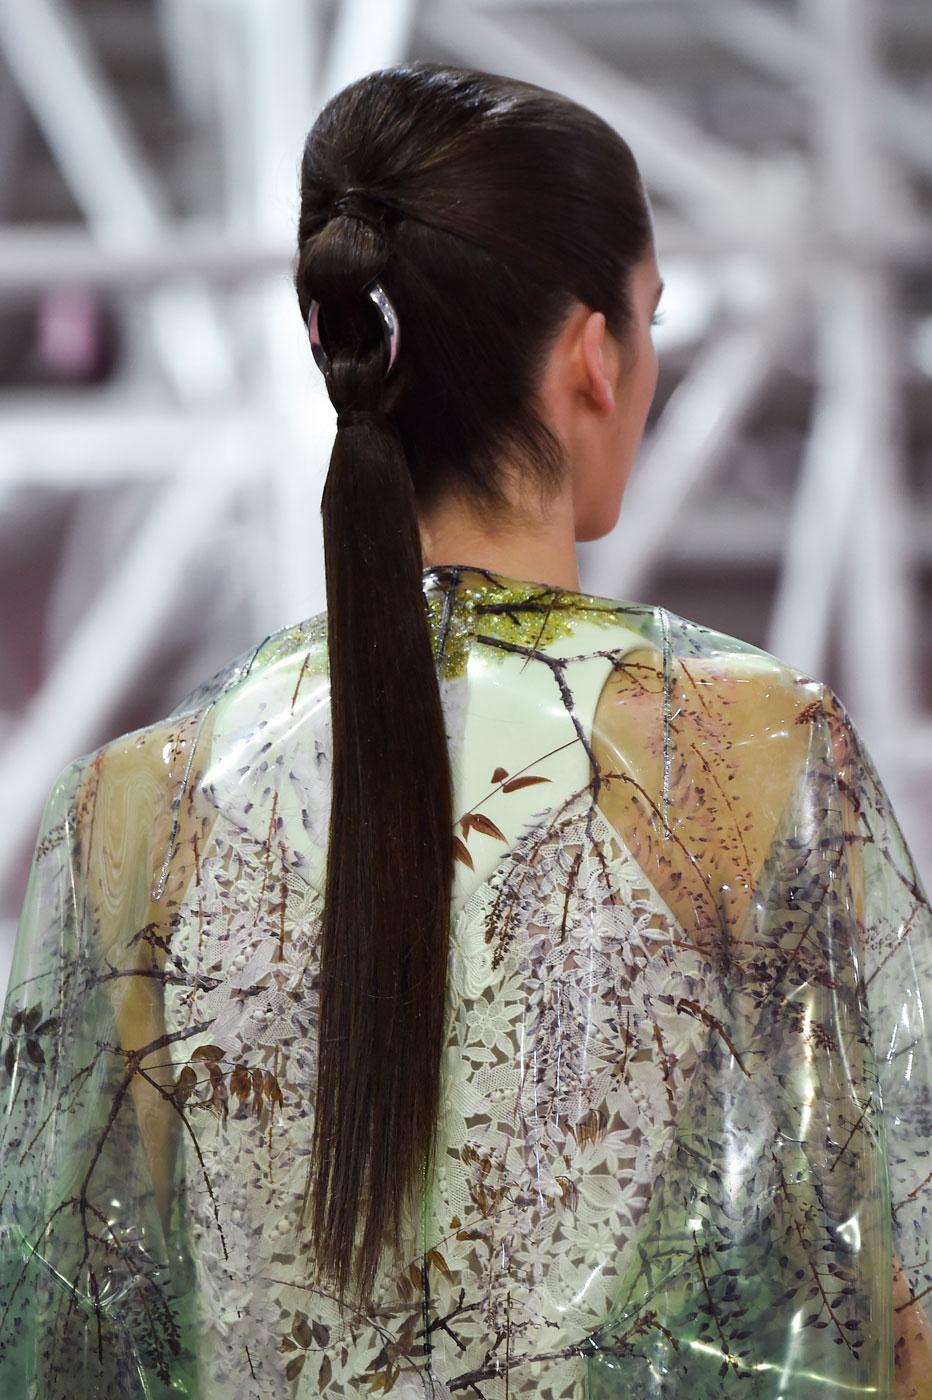 Christian-Dior-fashion-runway-show-close-ups-haute-couture-paris-spring-summer-2015-the-impression-004